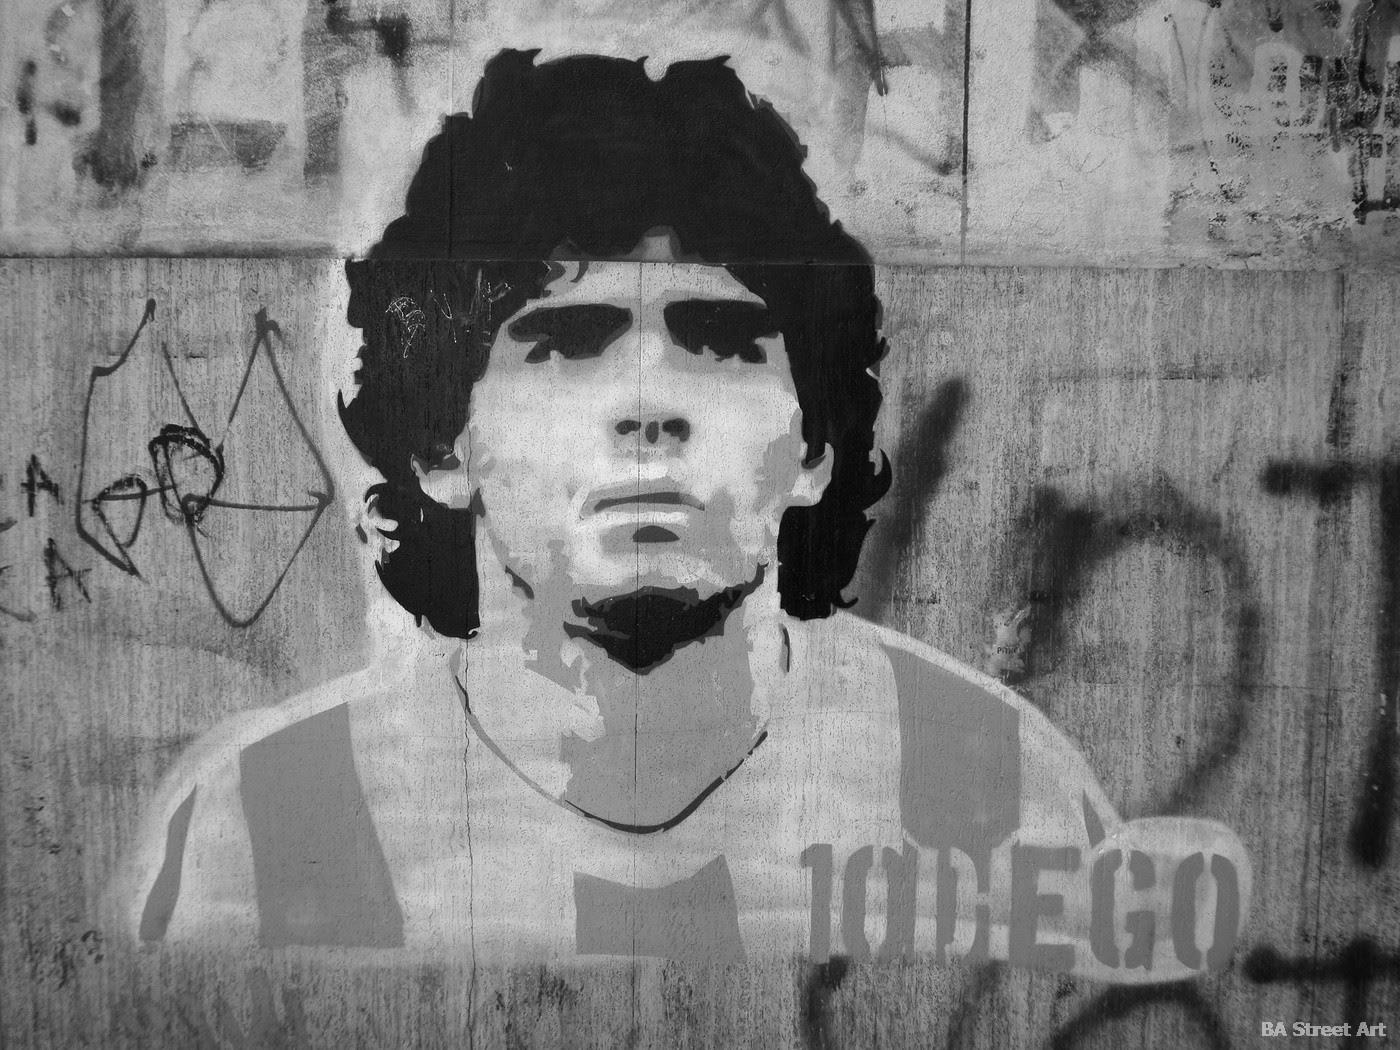 Graffiti depicting Maradona. Photo: Buenos Aires Street Art